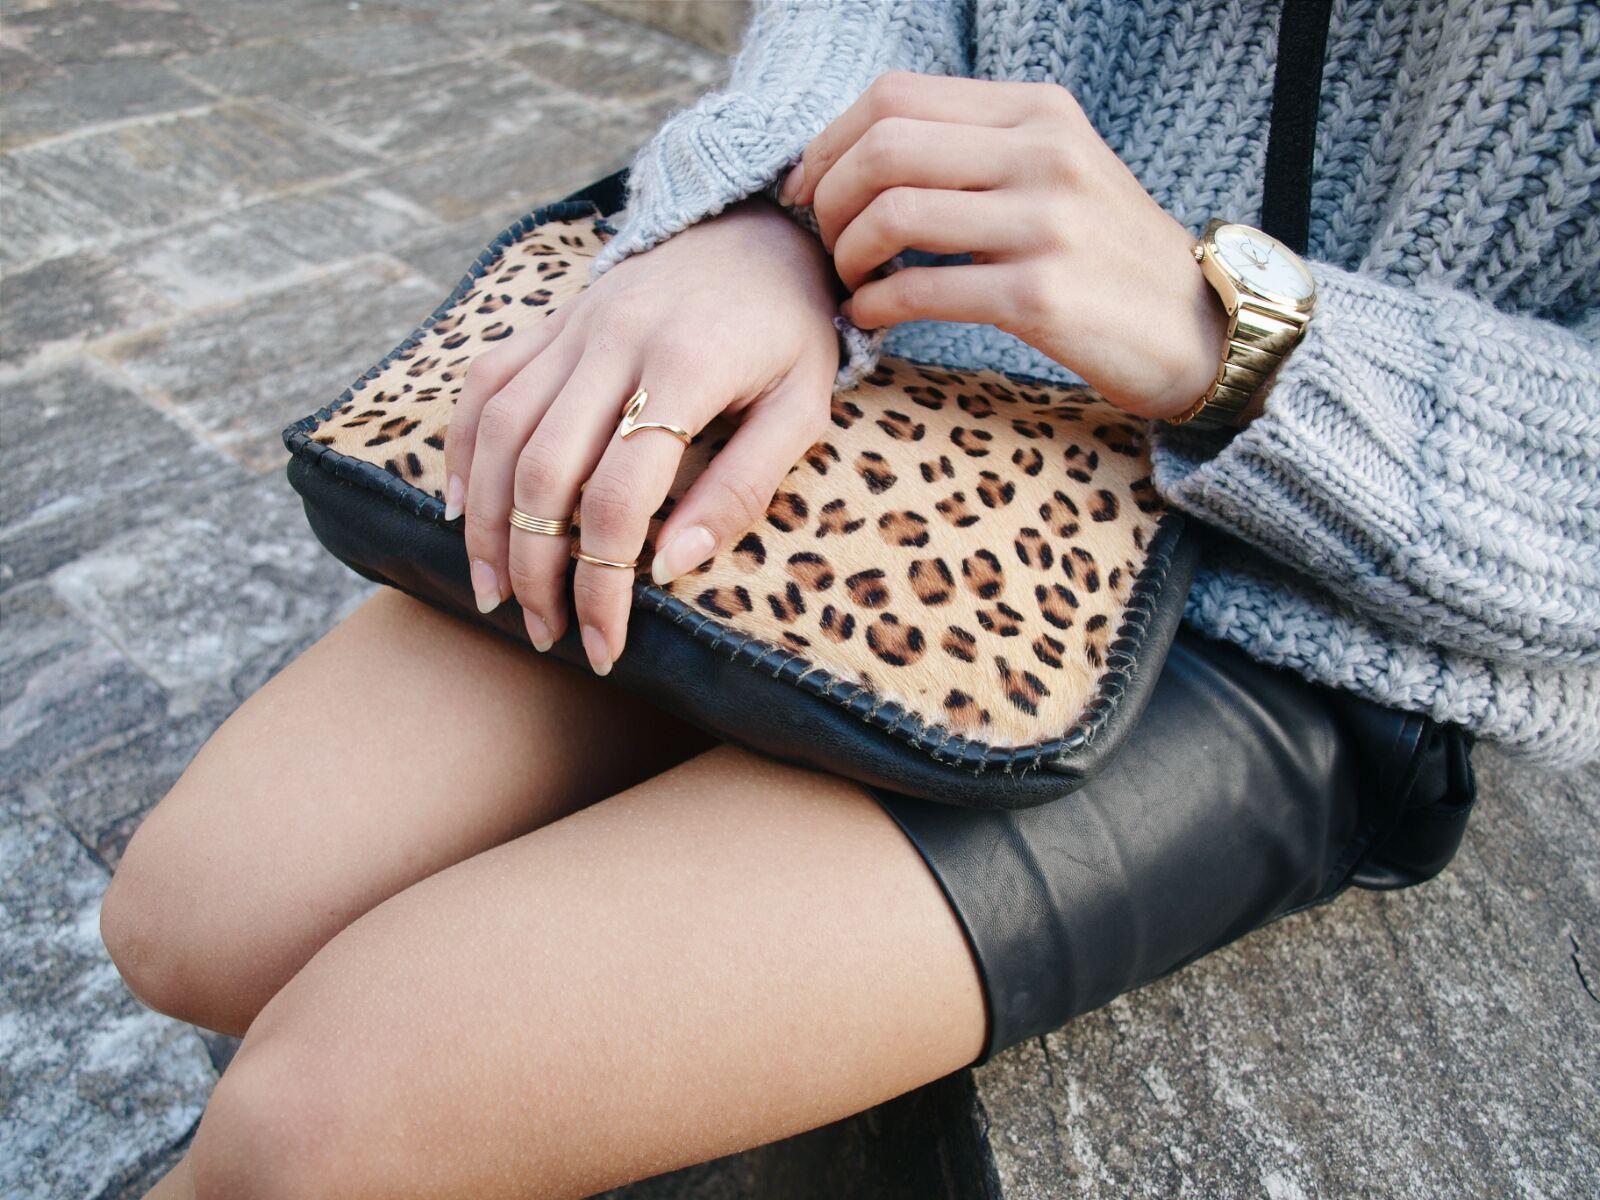 Coastalandco-blogger-hendaye-fuenterrabia-skirt-sweater-fashion-derbies-zara-lulucastagnette-cachecache-primark-asos